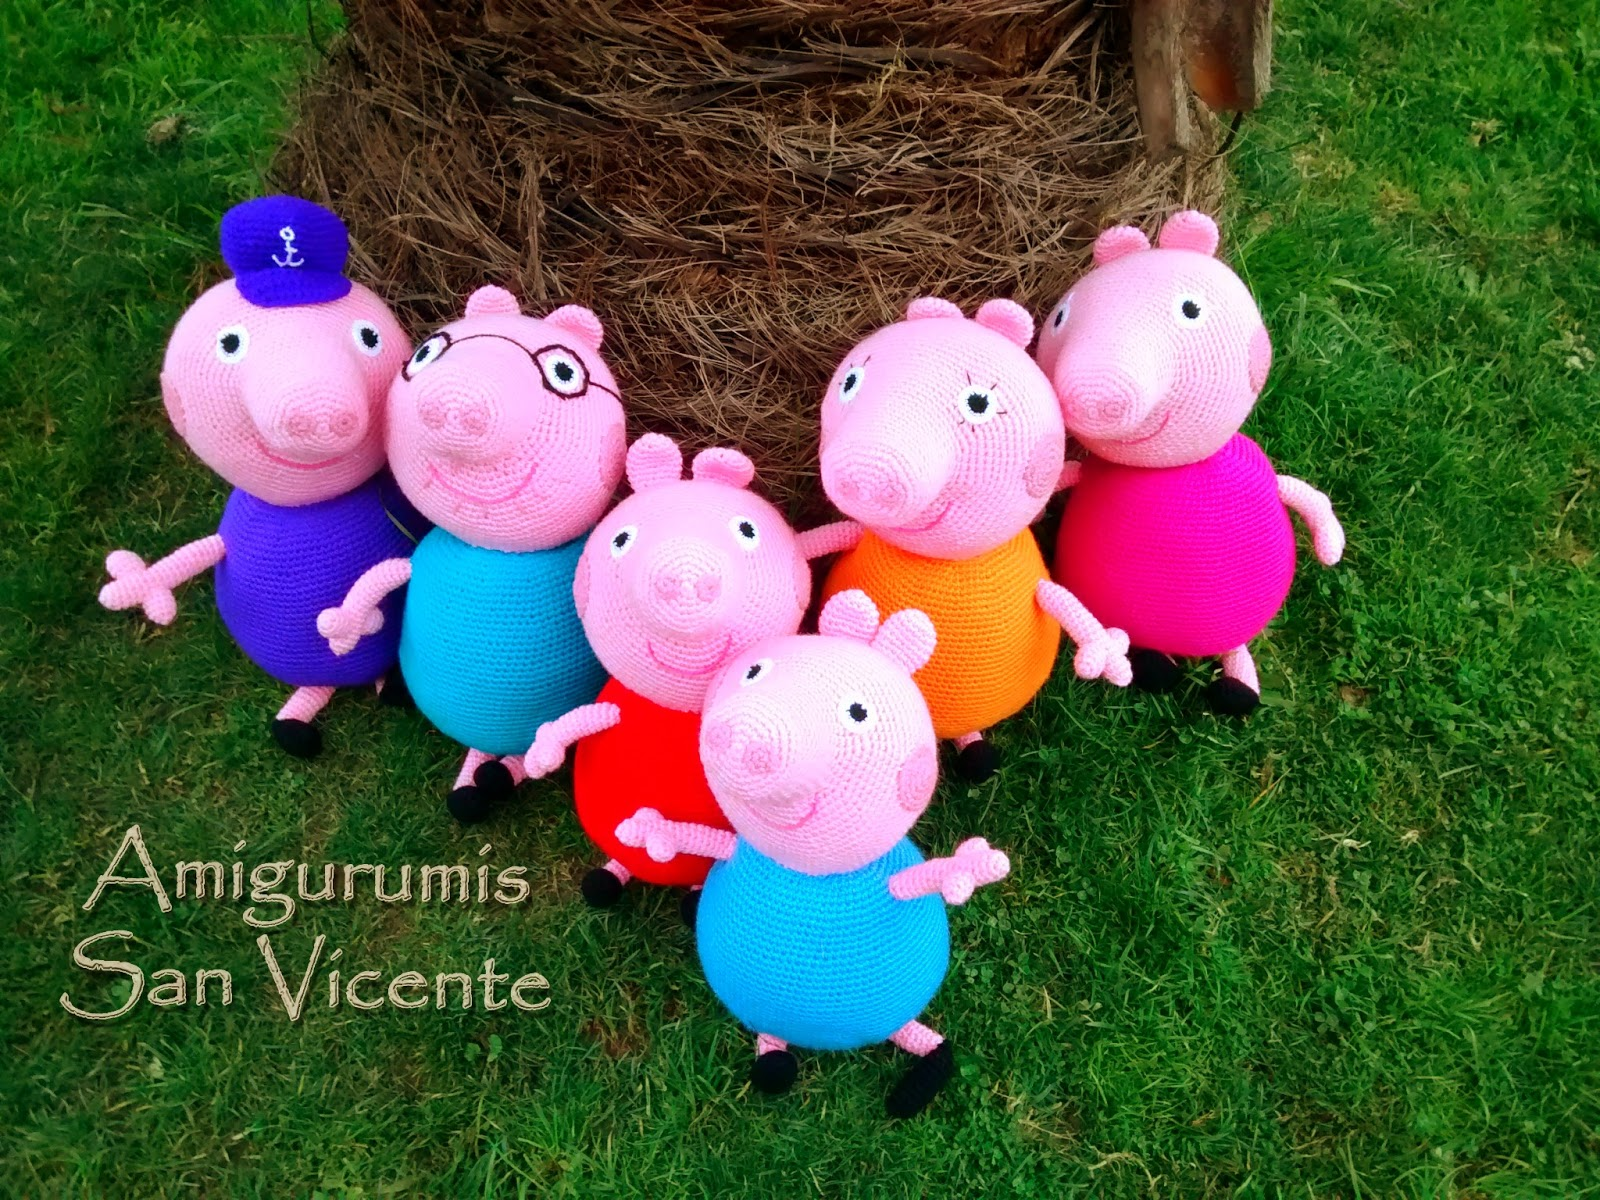 Peppa Pig amigurumi artedetei   Peppa pig amigurumi, Patrones ...   1200x1600